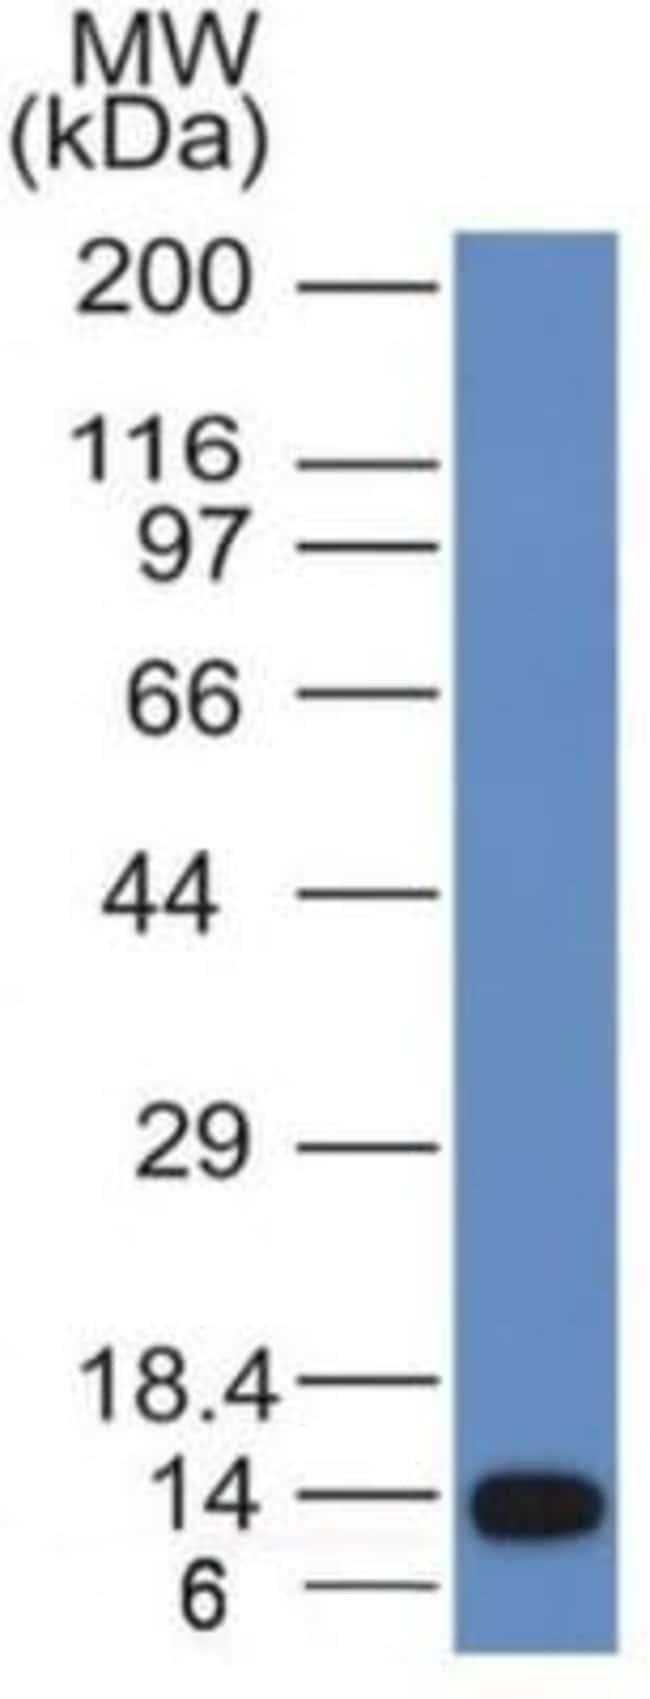 ALK/CD246 Mouse anti-Human, Clone: ALK/1031, Novus Biologicals:Antibodies:Primary